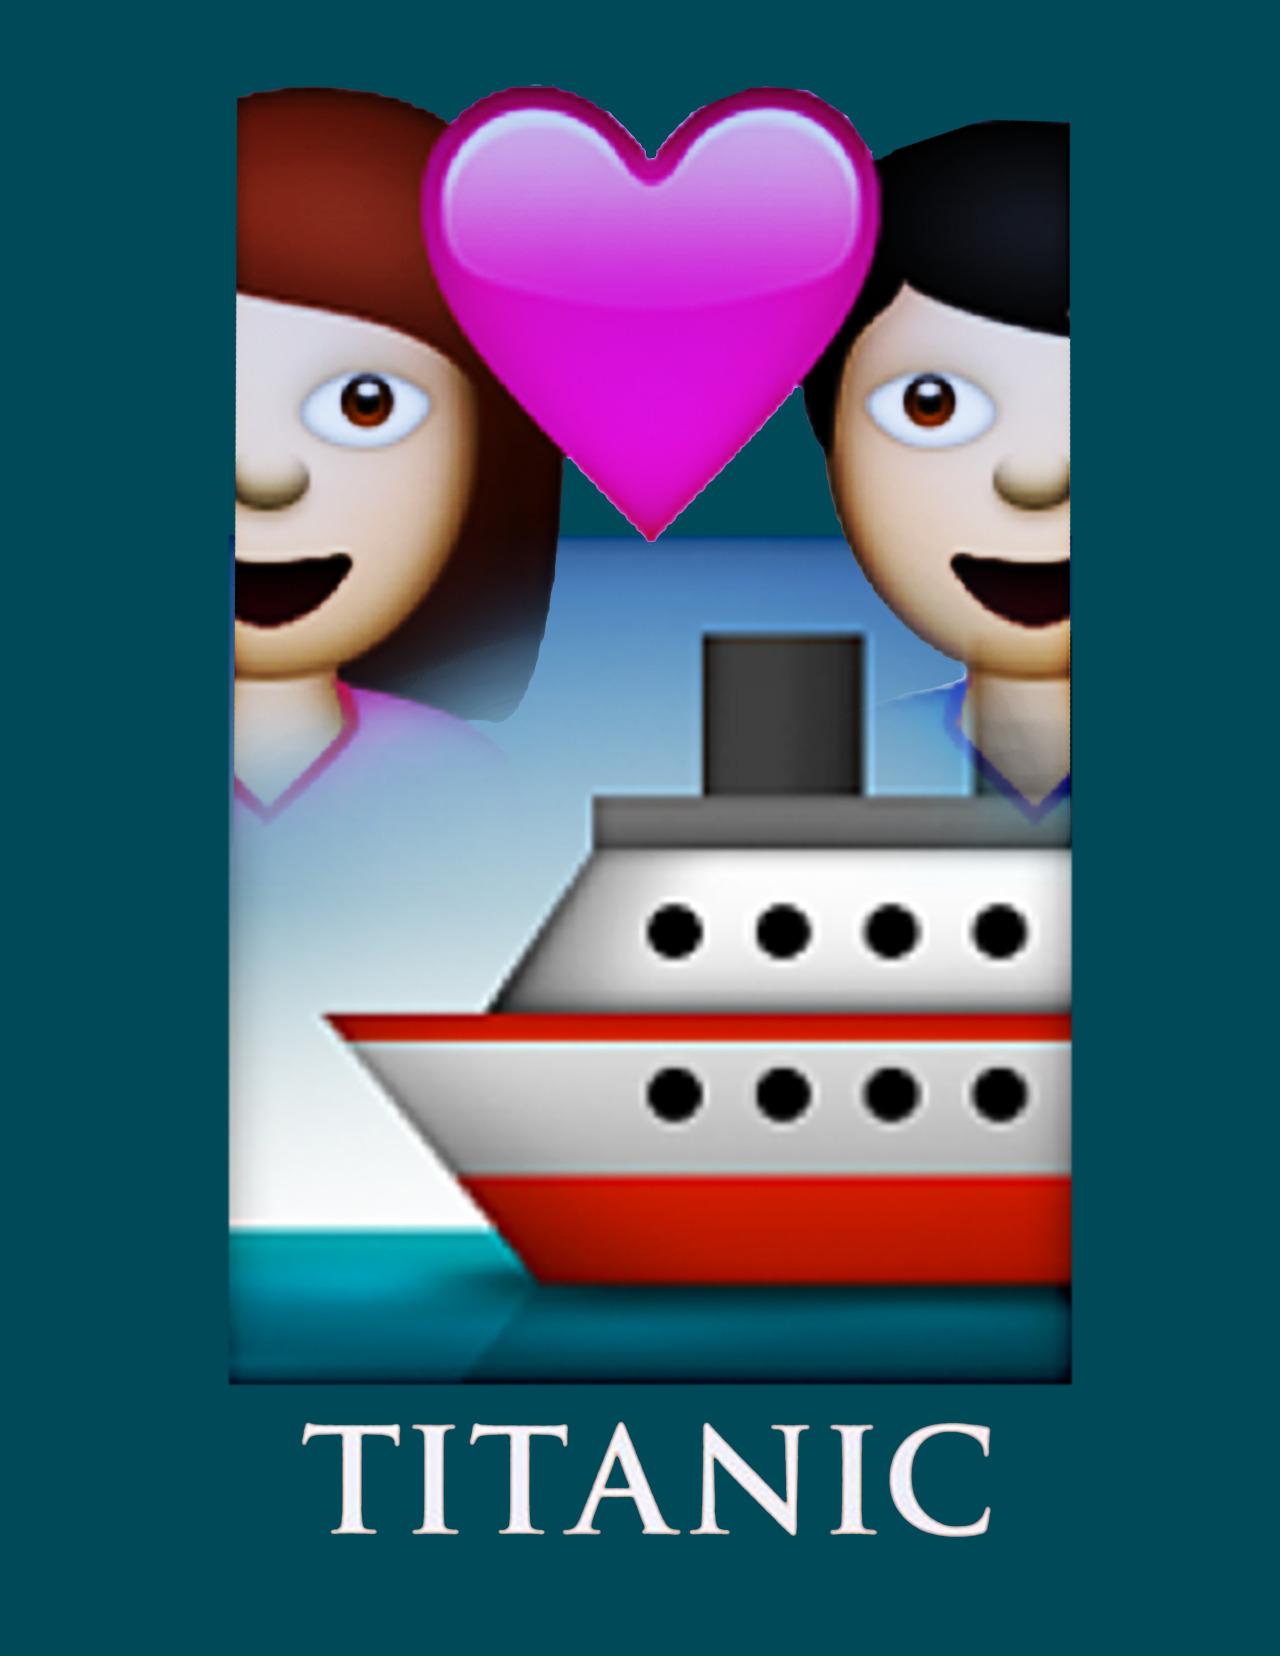 Титаник, Джеймс Кэмерон